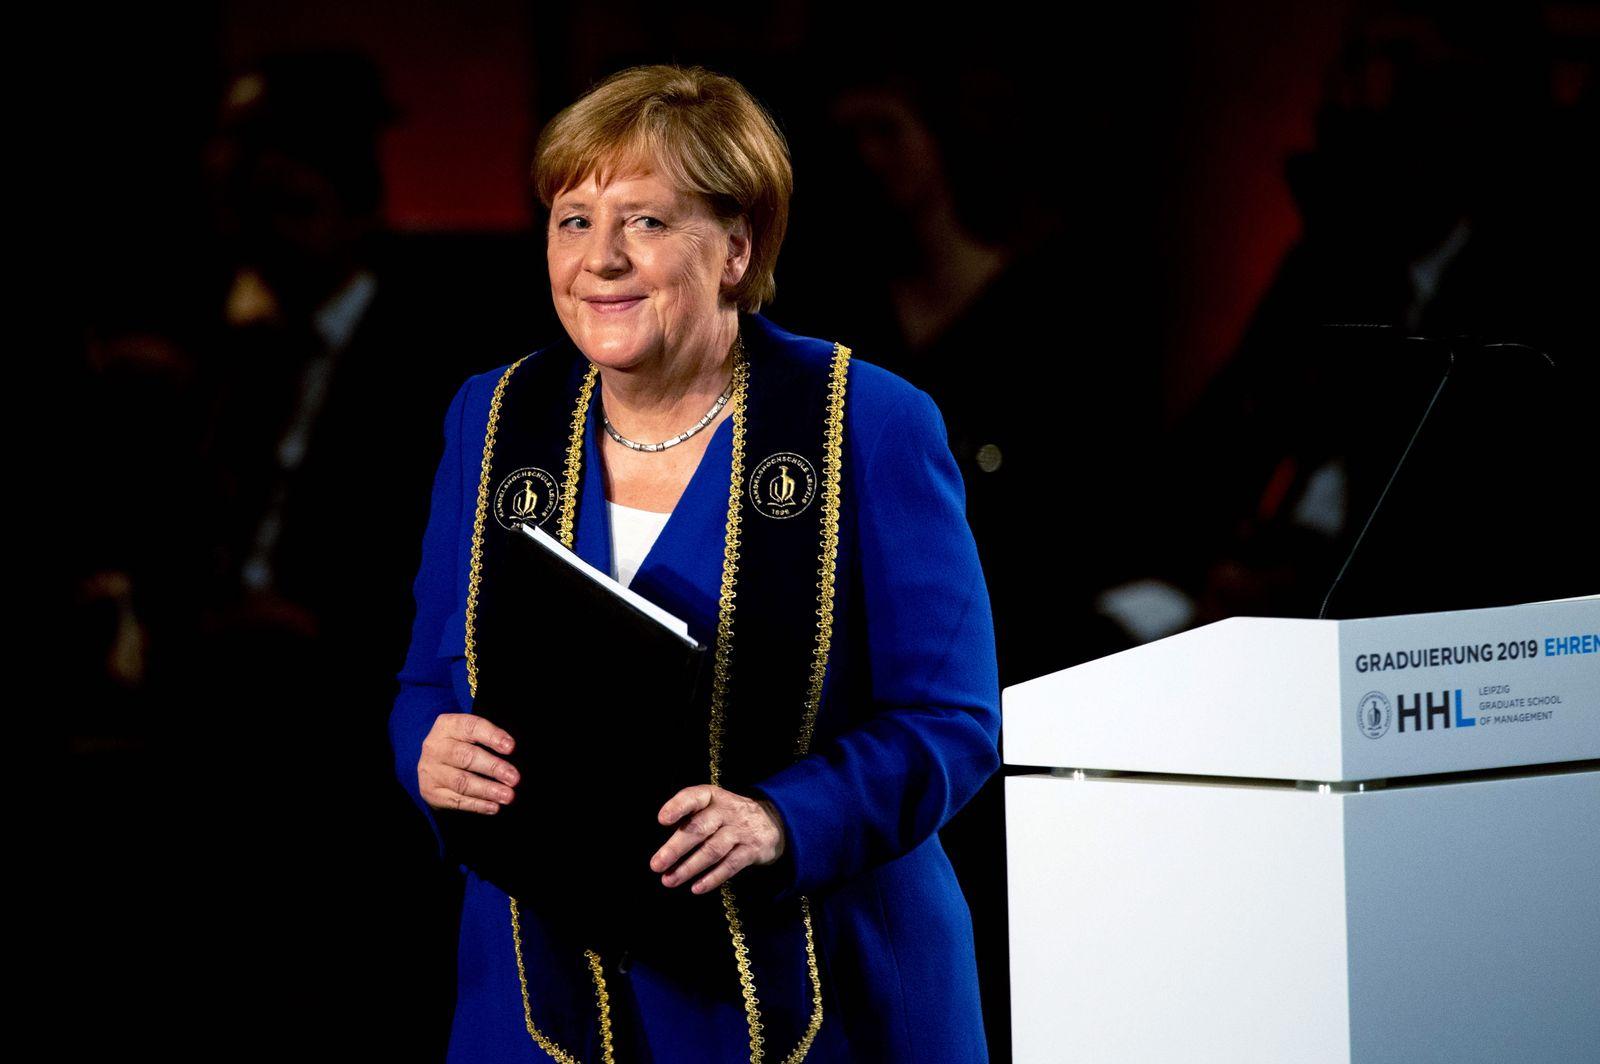 Angela Merkel/ HHL Leipzig